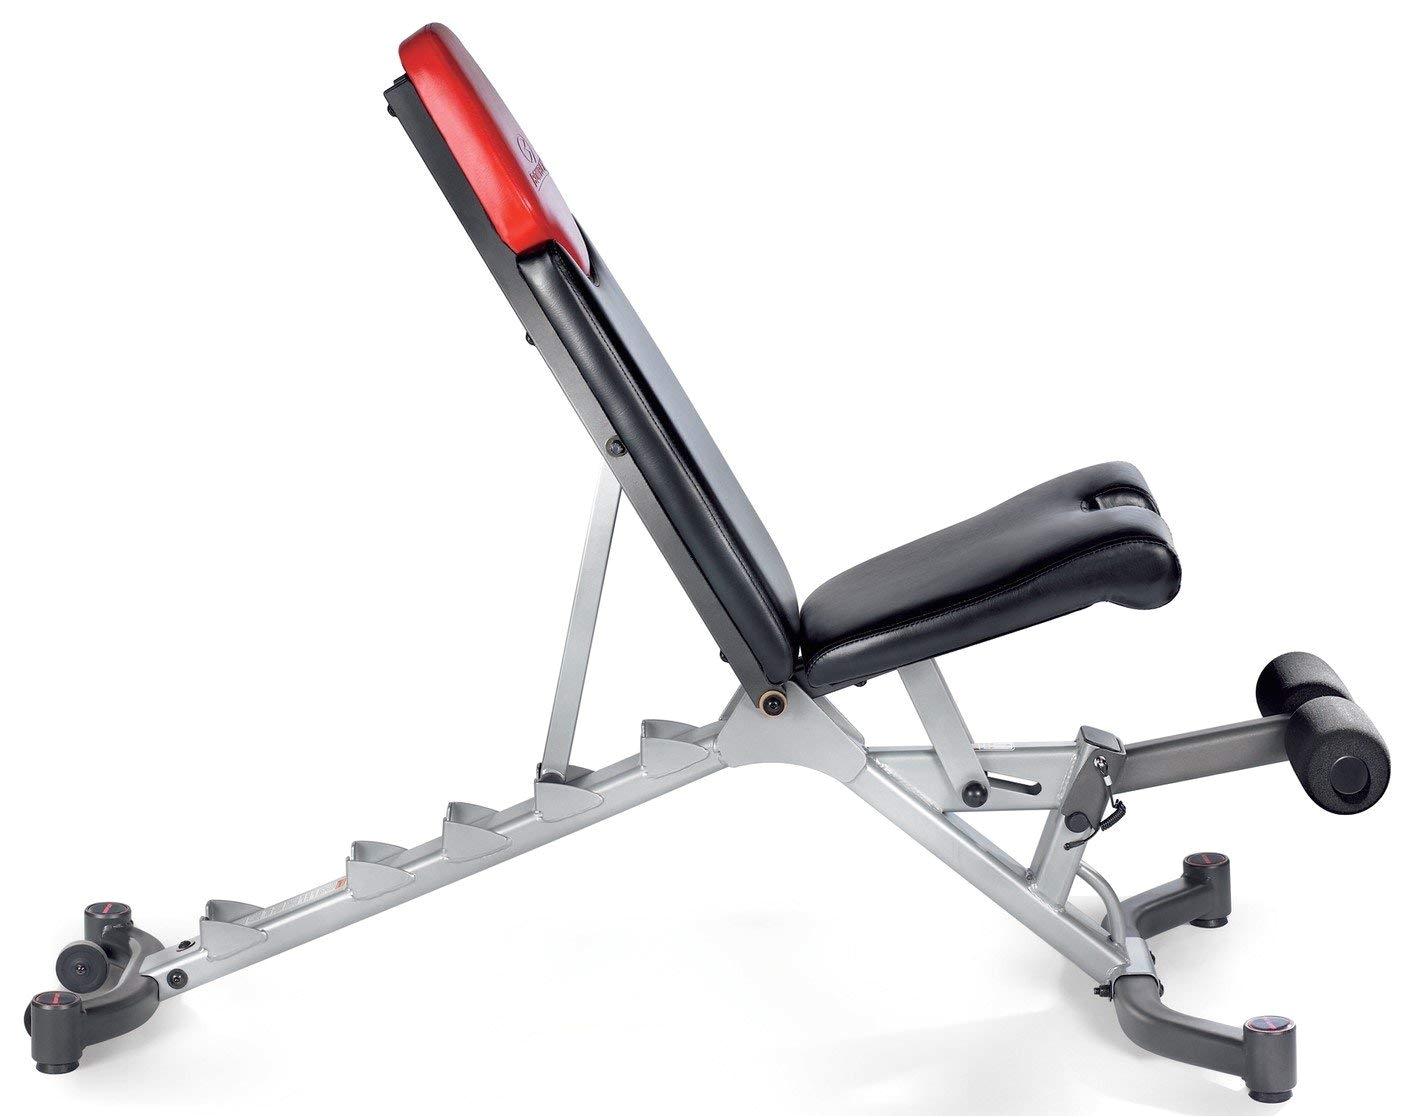 amazon com bowflex 5 1 adjustable weight bench adjustable weight benches sports outdoors